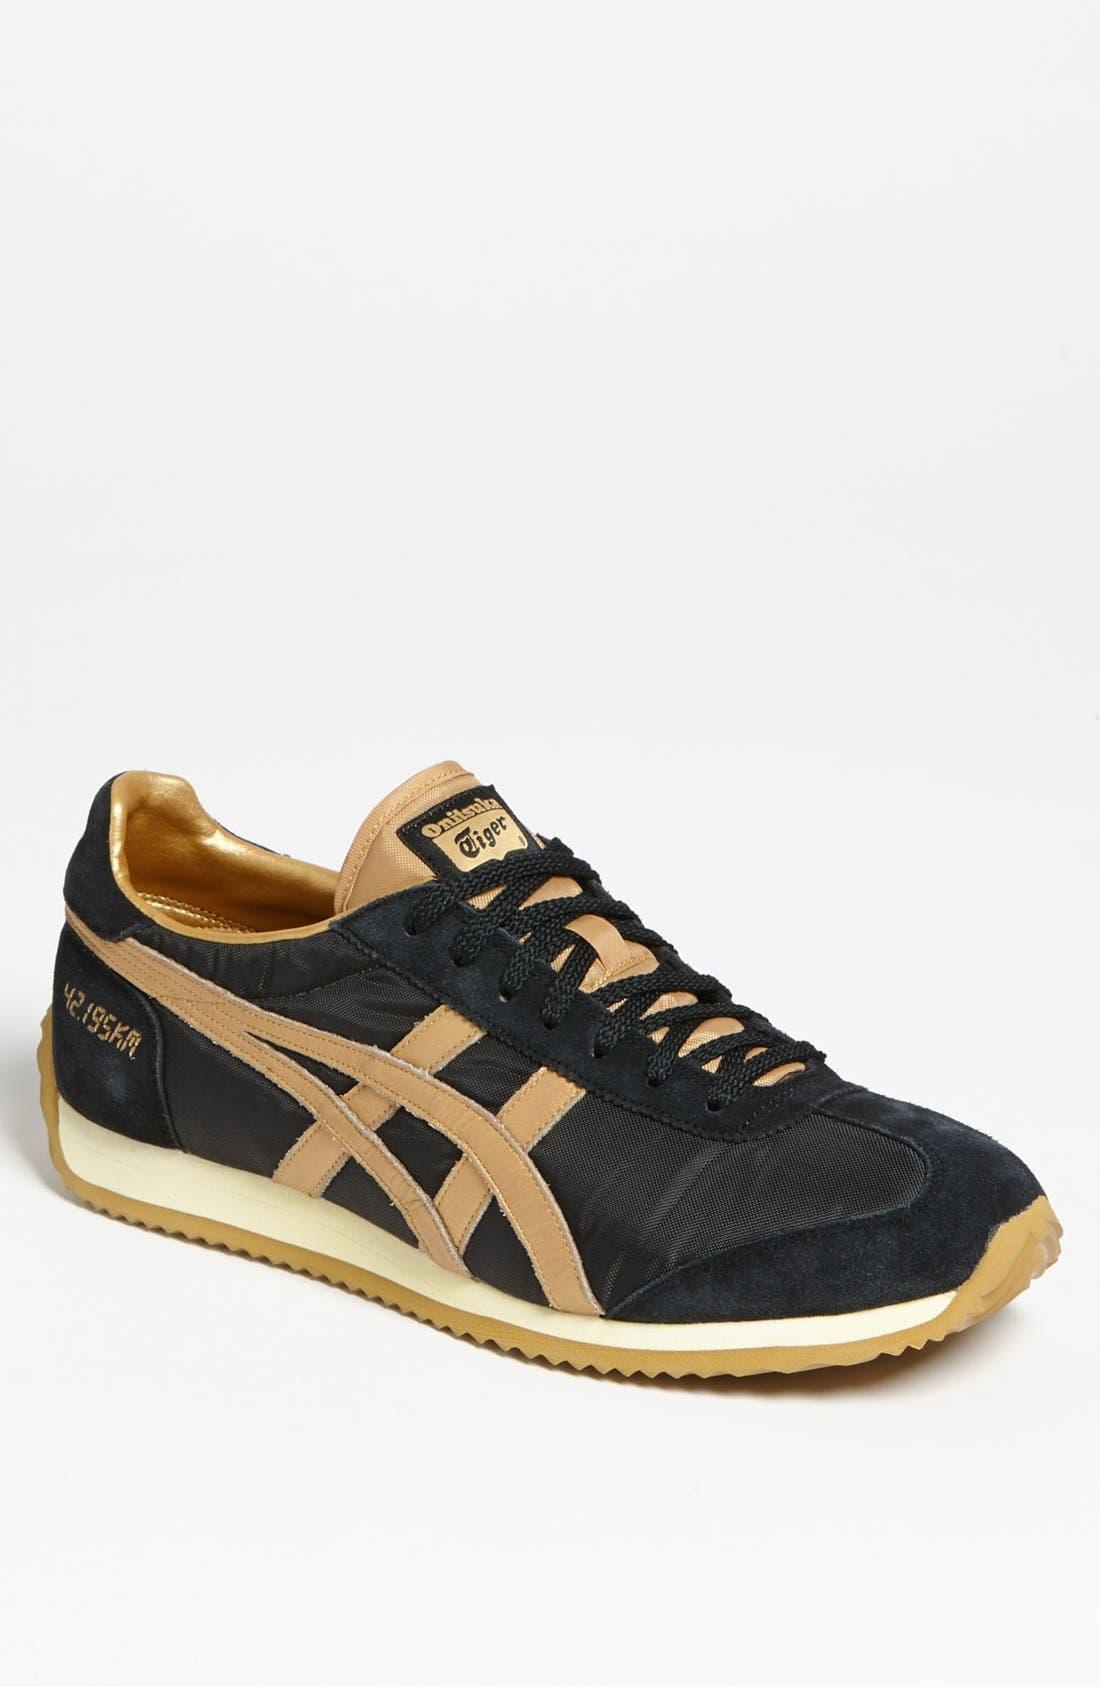 Alternate Image 1 Selected - Onitsuka Tiger™ 'California 78 OG' Sneaker (Men)